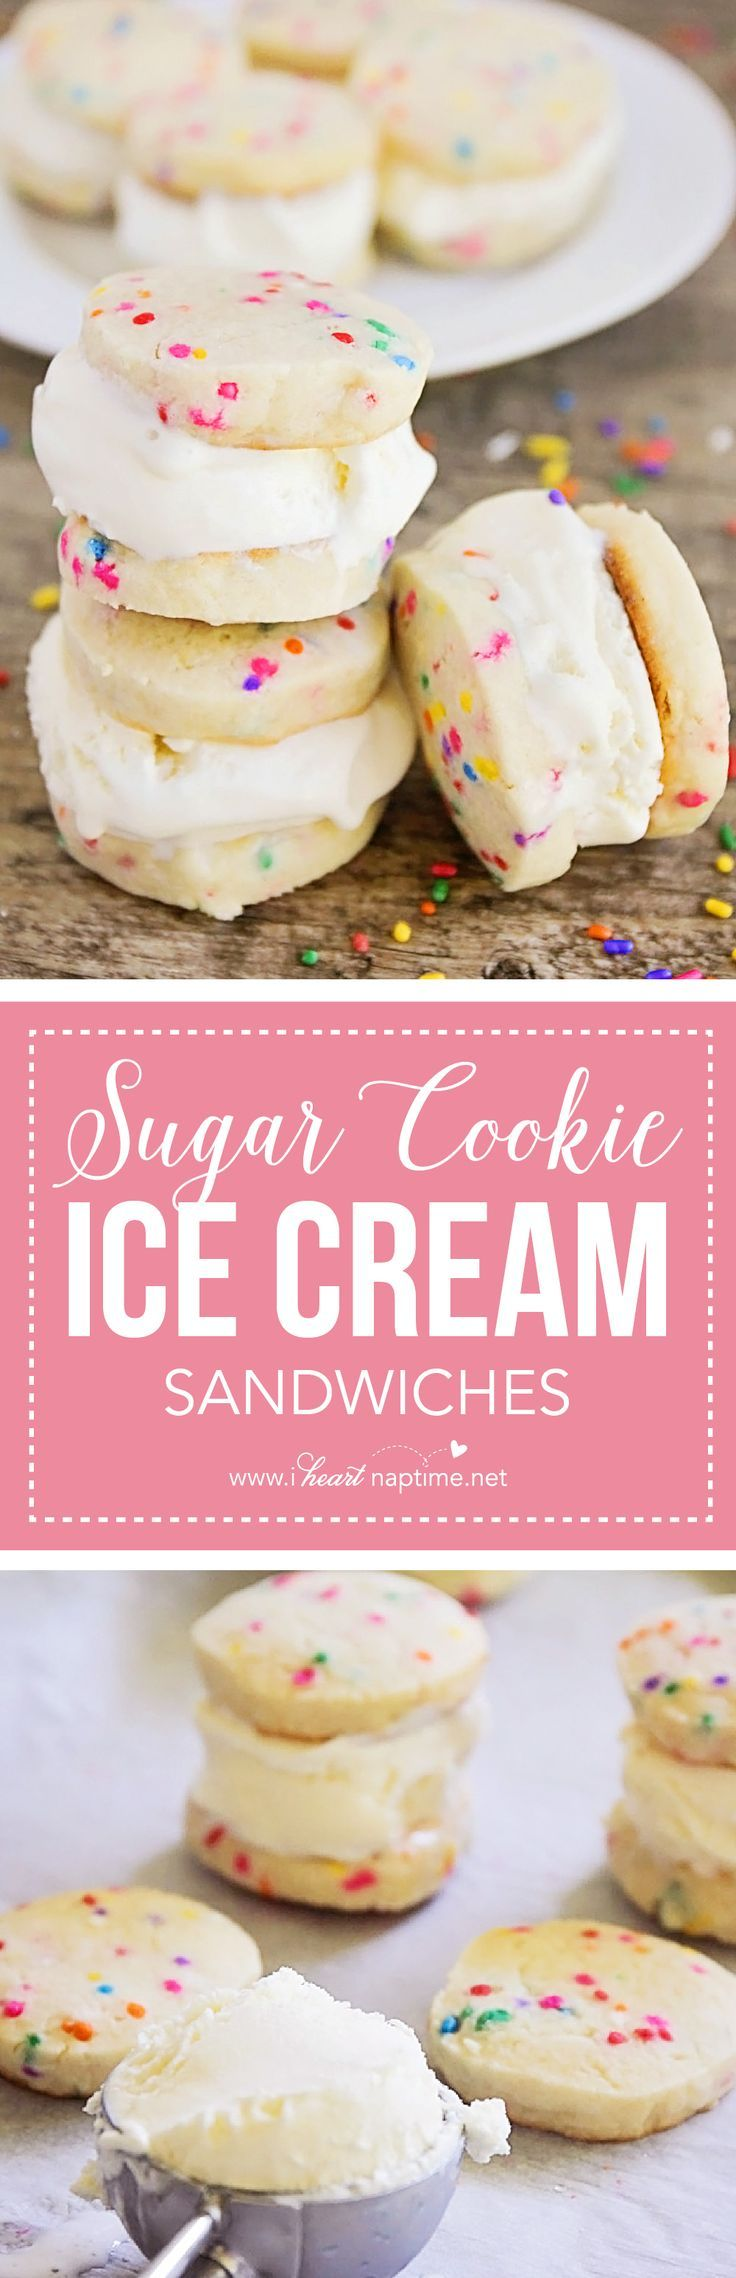 Sugar Cookie Ice Cream Sandwiches - creamy vanilla ice cream sandwiched between crisp and buttery sugar cookies. The perfect summer dessert!